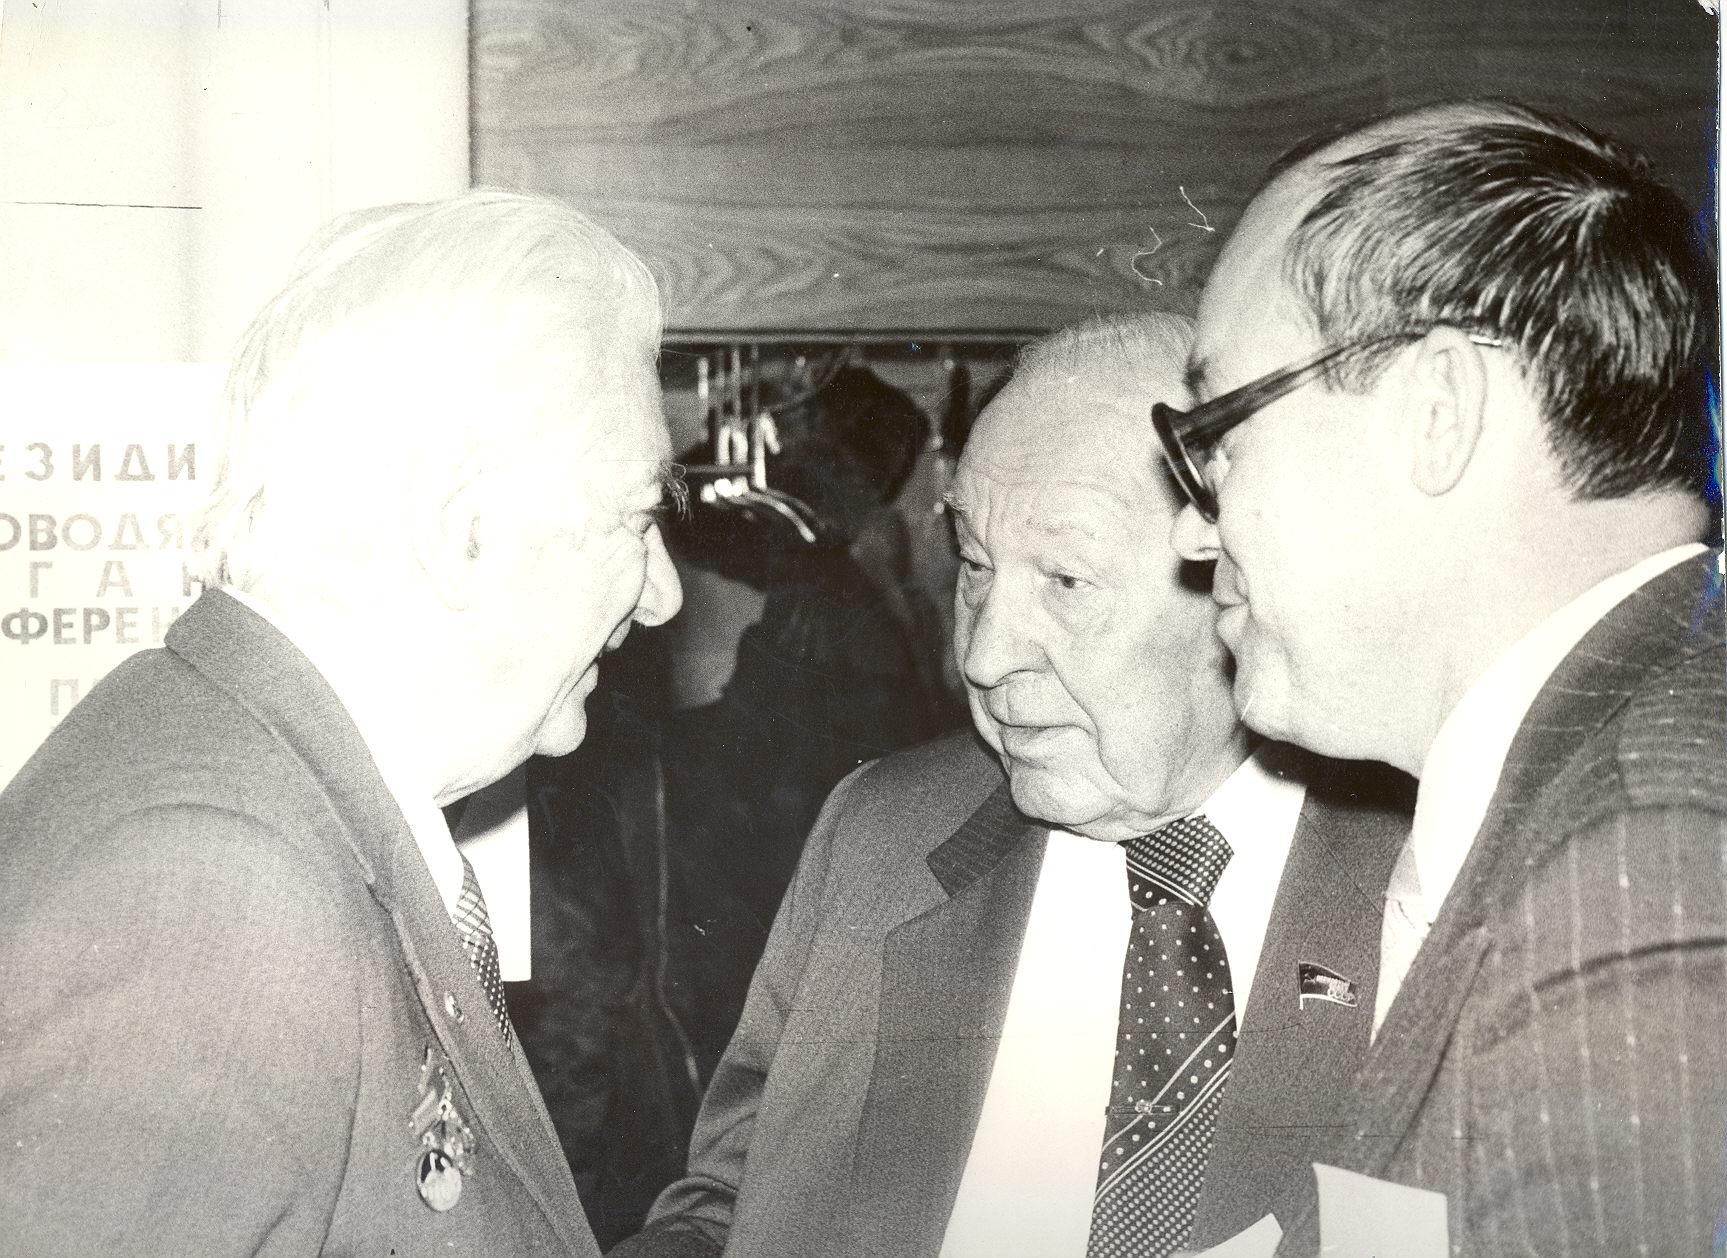 Справа - В.П. Насонов; в центре - Е.П. Славский